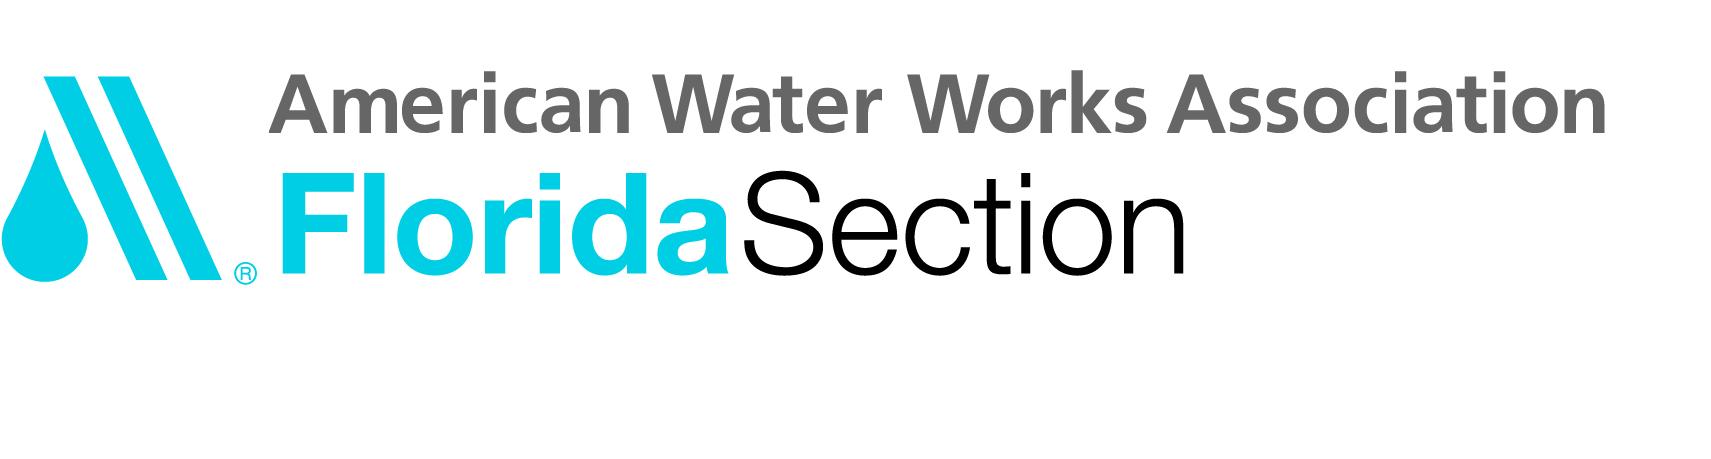 Job Posting For Pinehill Water Works 78